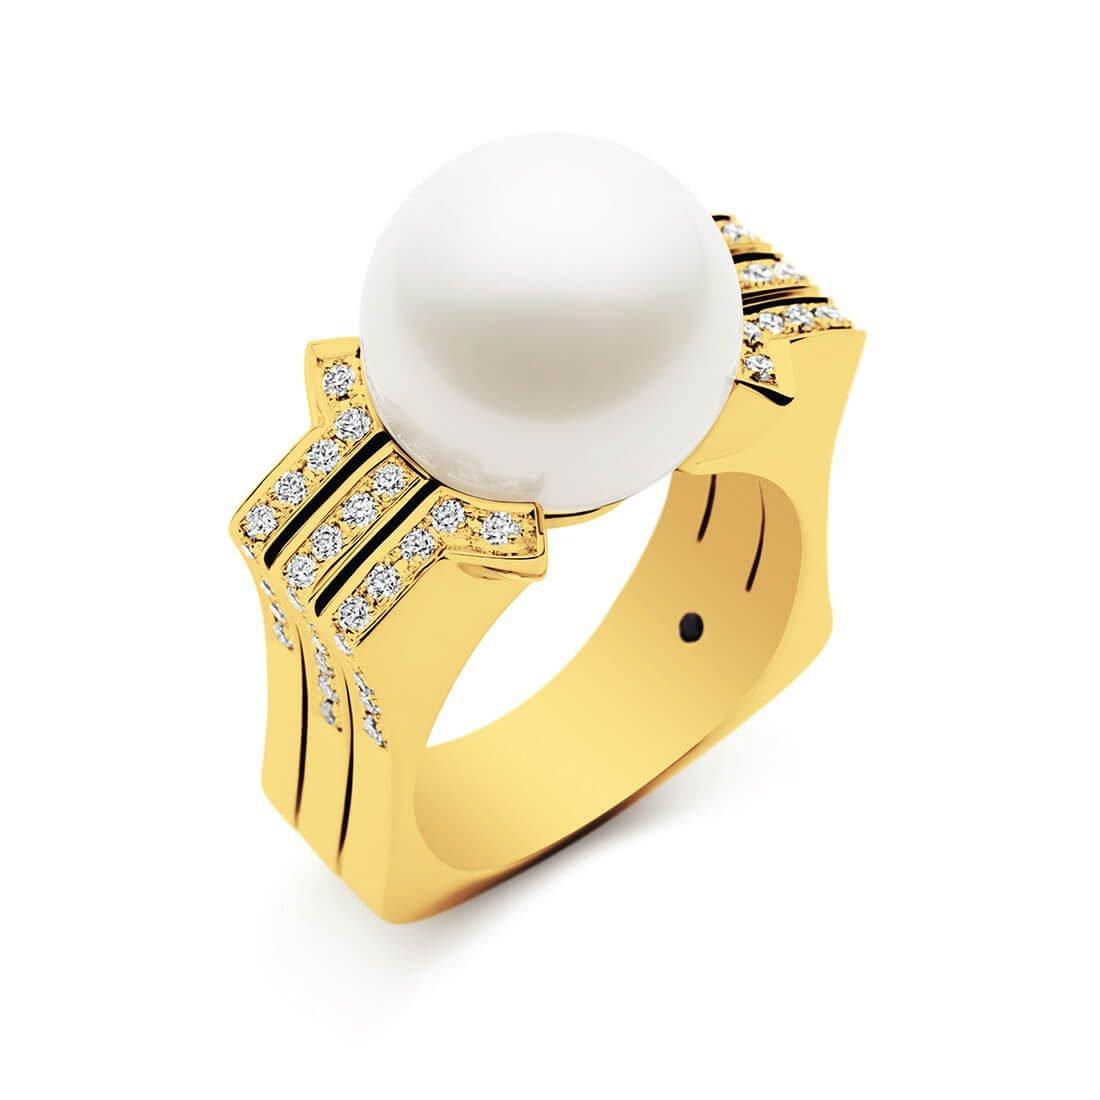 Kailis - Metropolis Ring, Yellow Gold